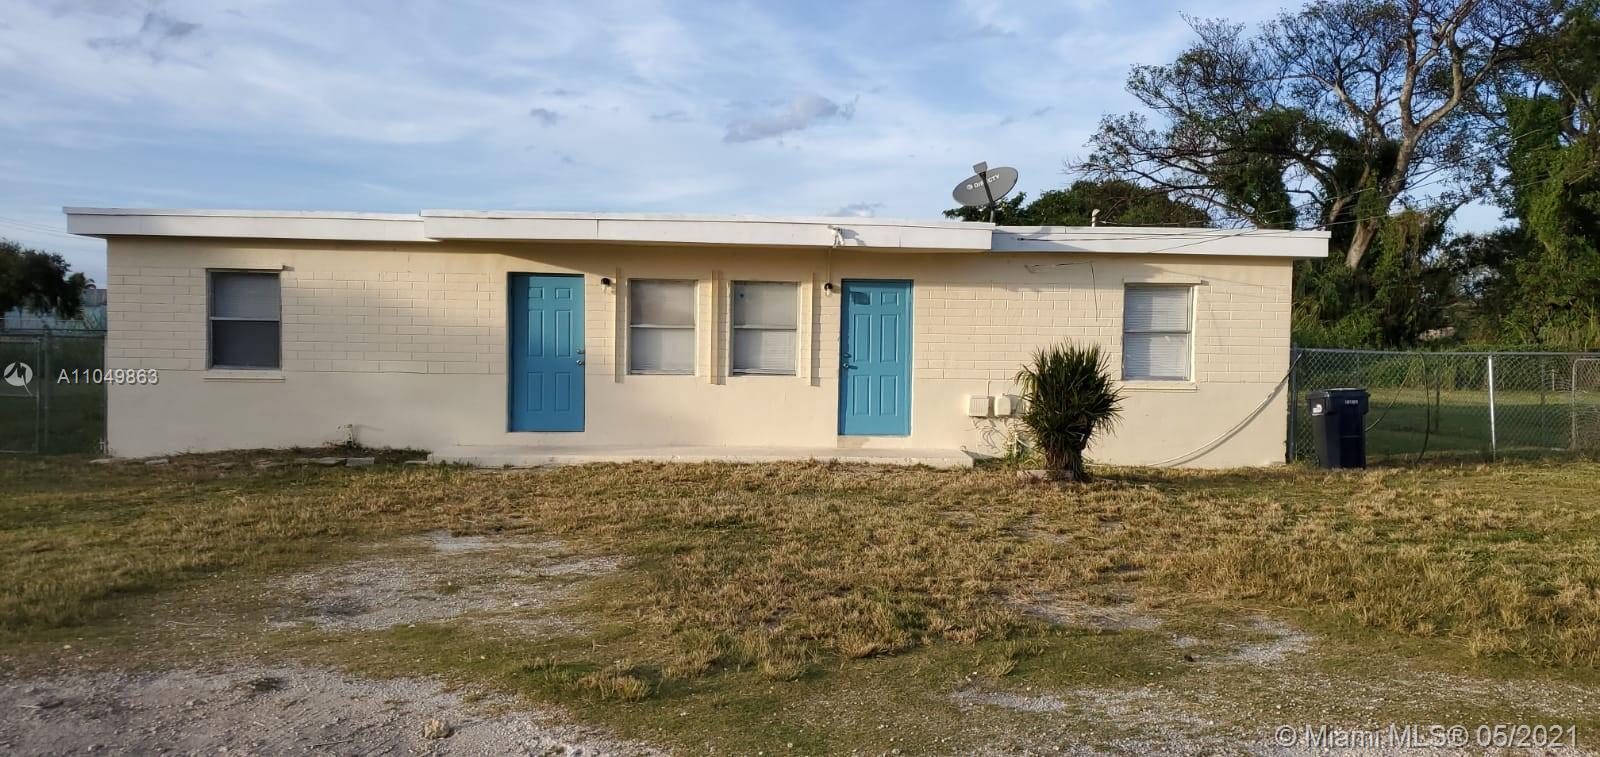 /  3527 sq. ft. $ 2021-05-31 0 Photo